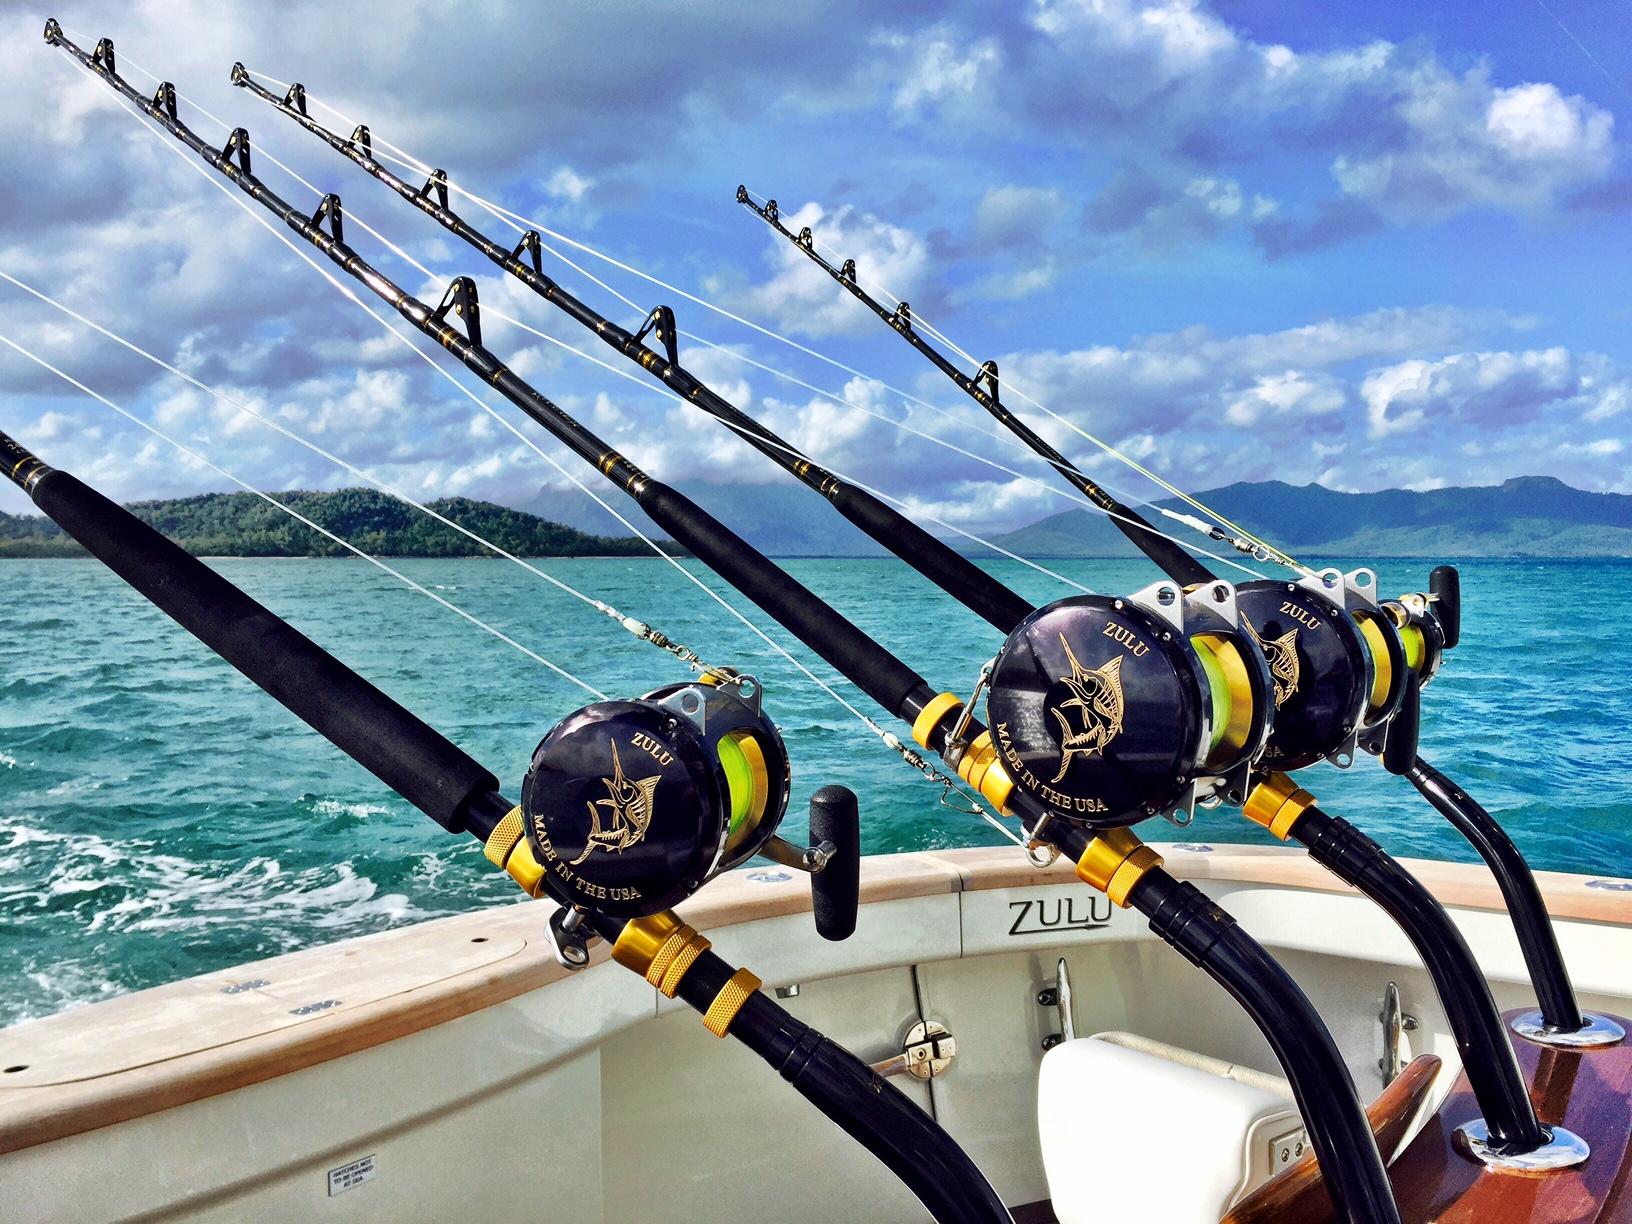 2017 Giant Black Marlin Season | CAIRNS – Zulu Game Fishing